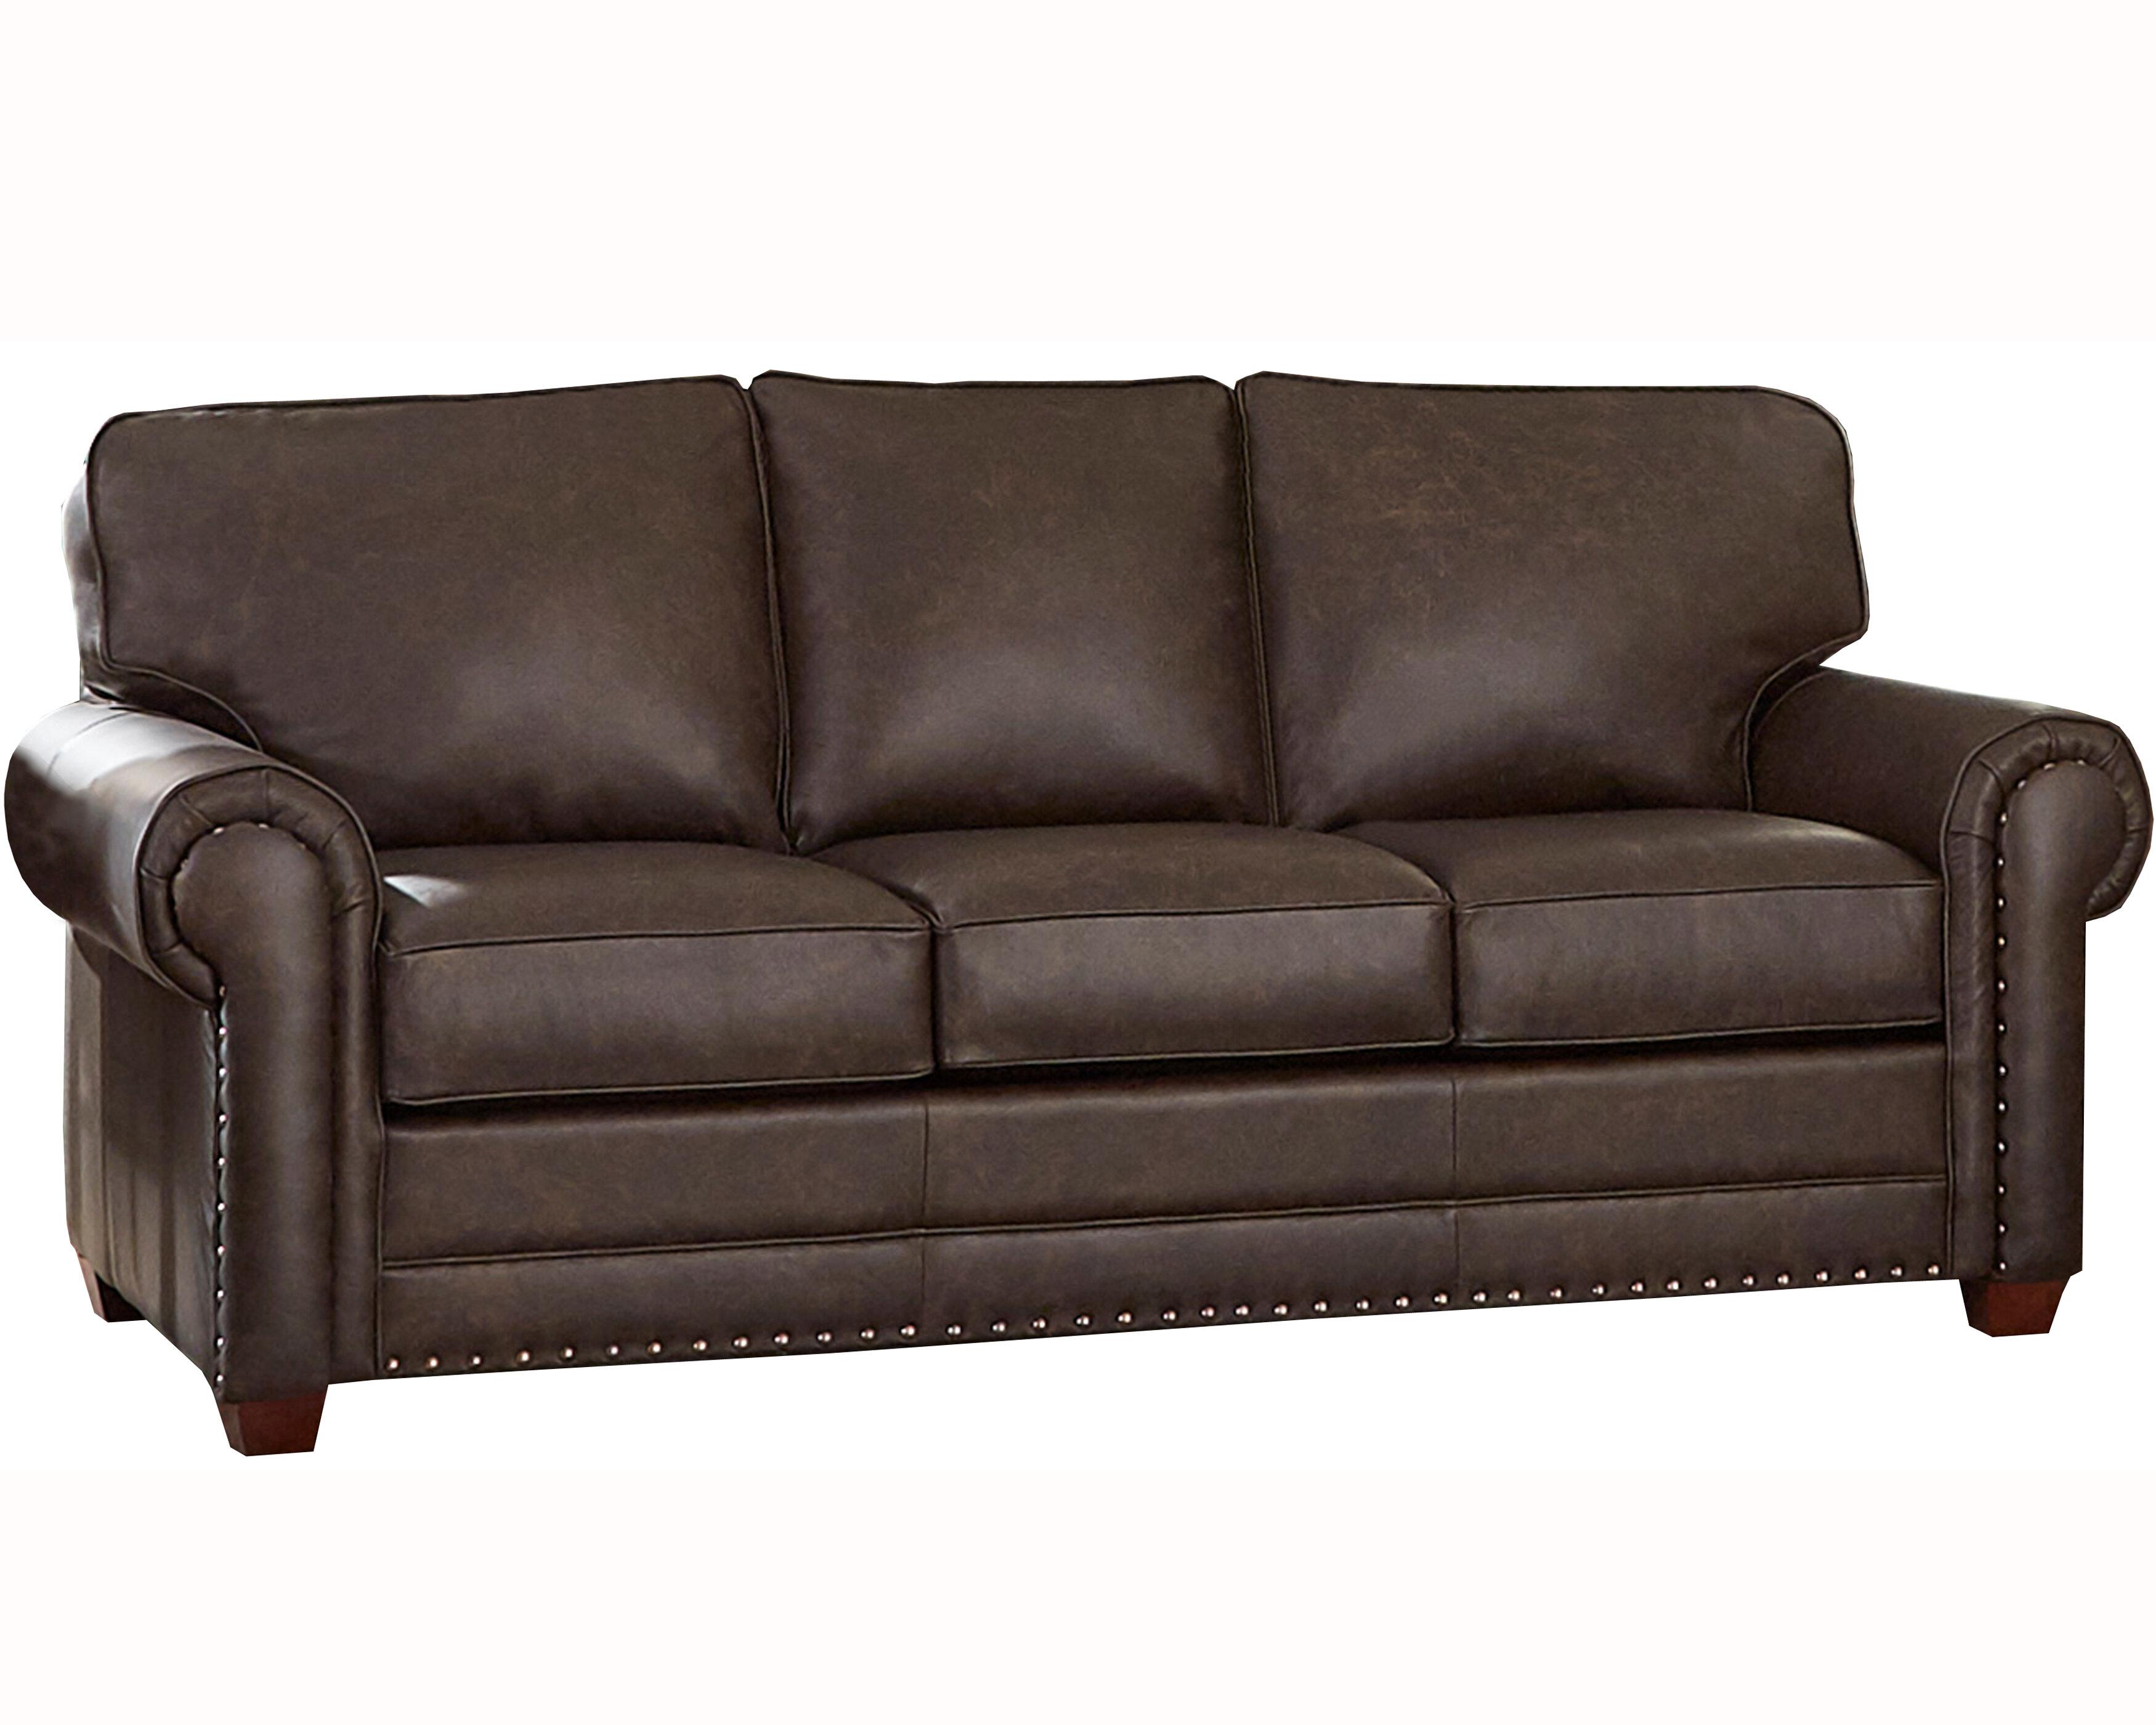 - 17 Stories Lexus Leather Sofa Bed Wayfair